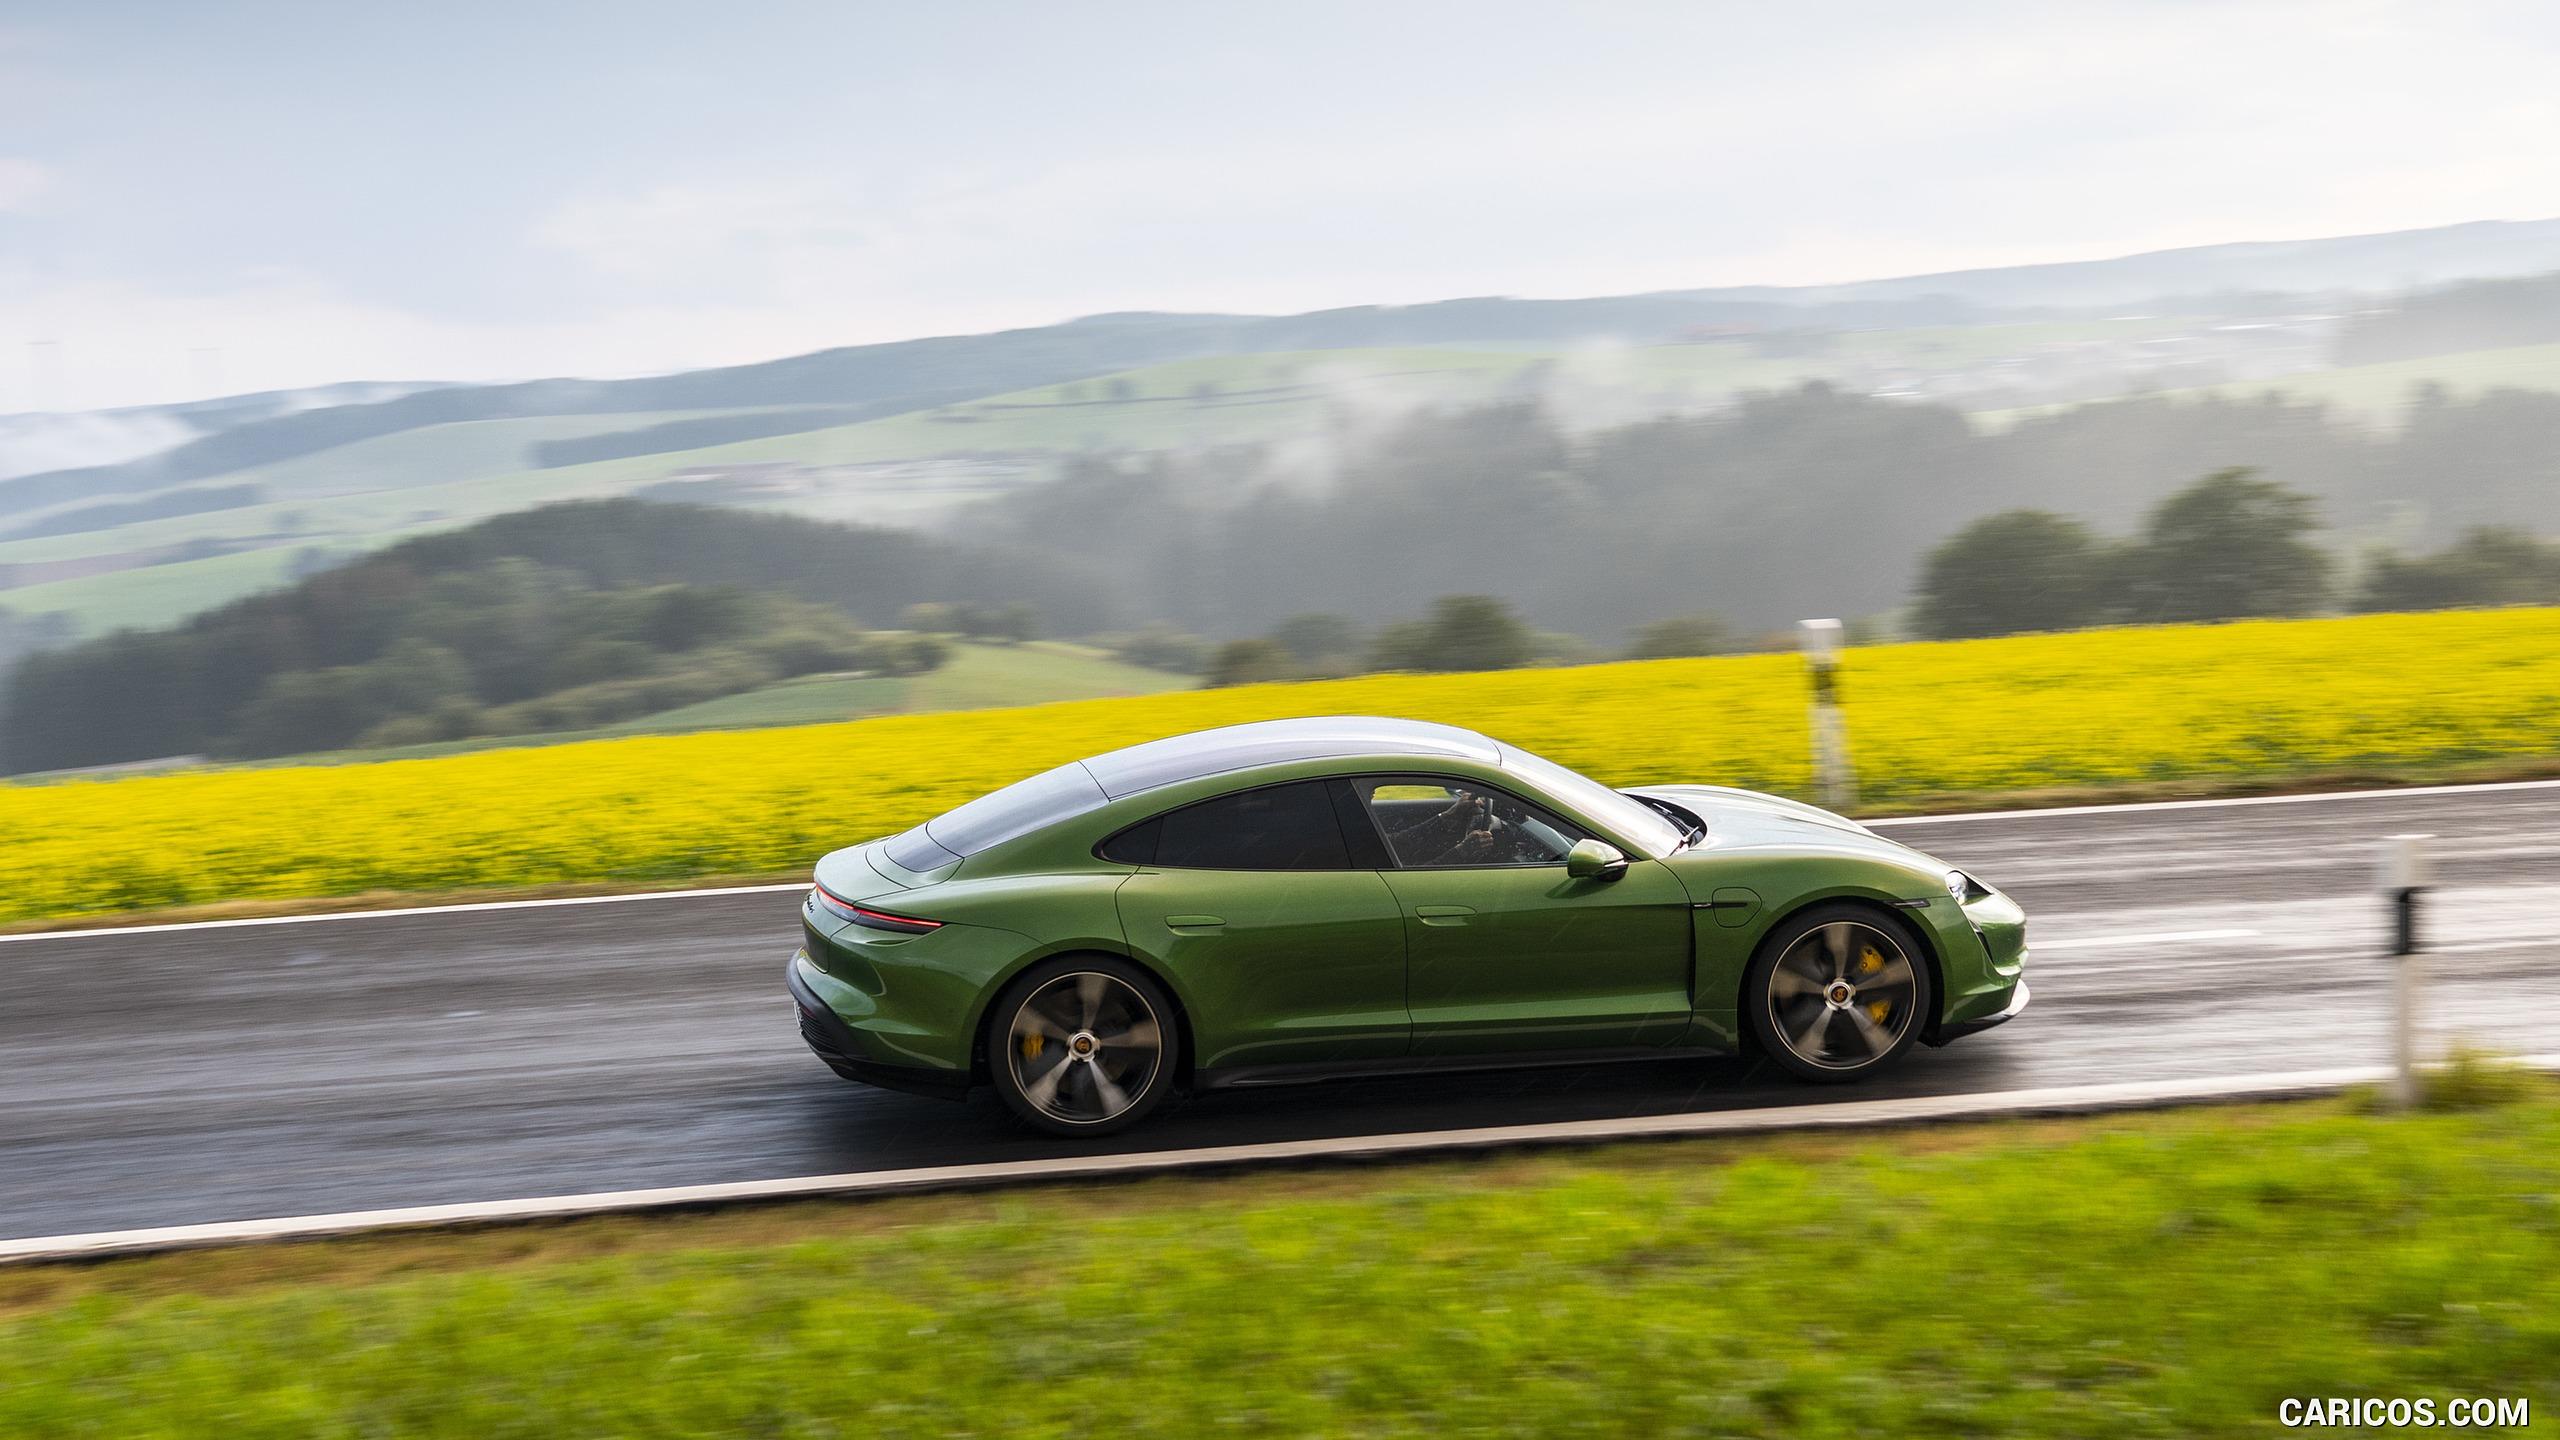 2020 Porsche Taycan Turbo S Color Mamba Green Metallic   Side 2560x1440